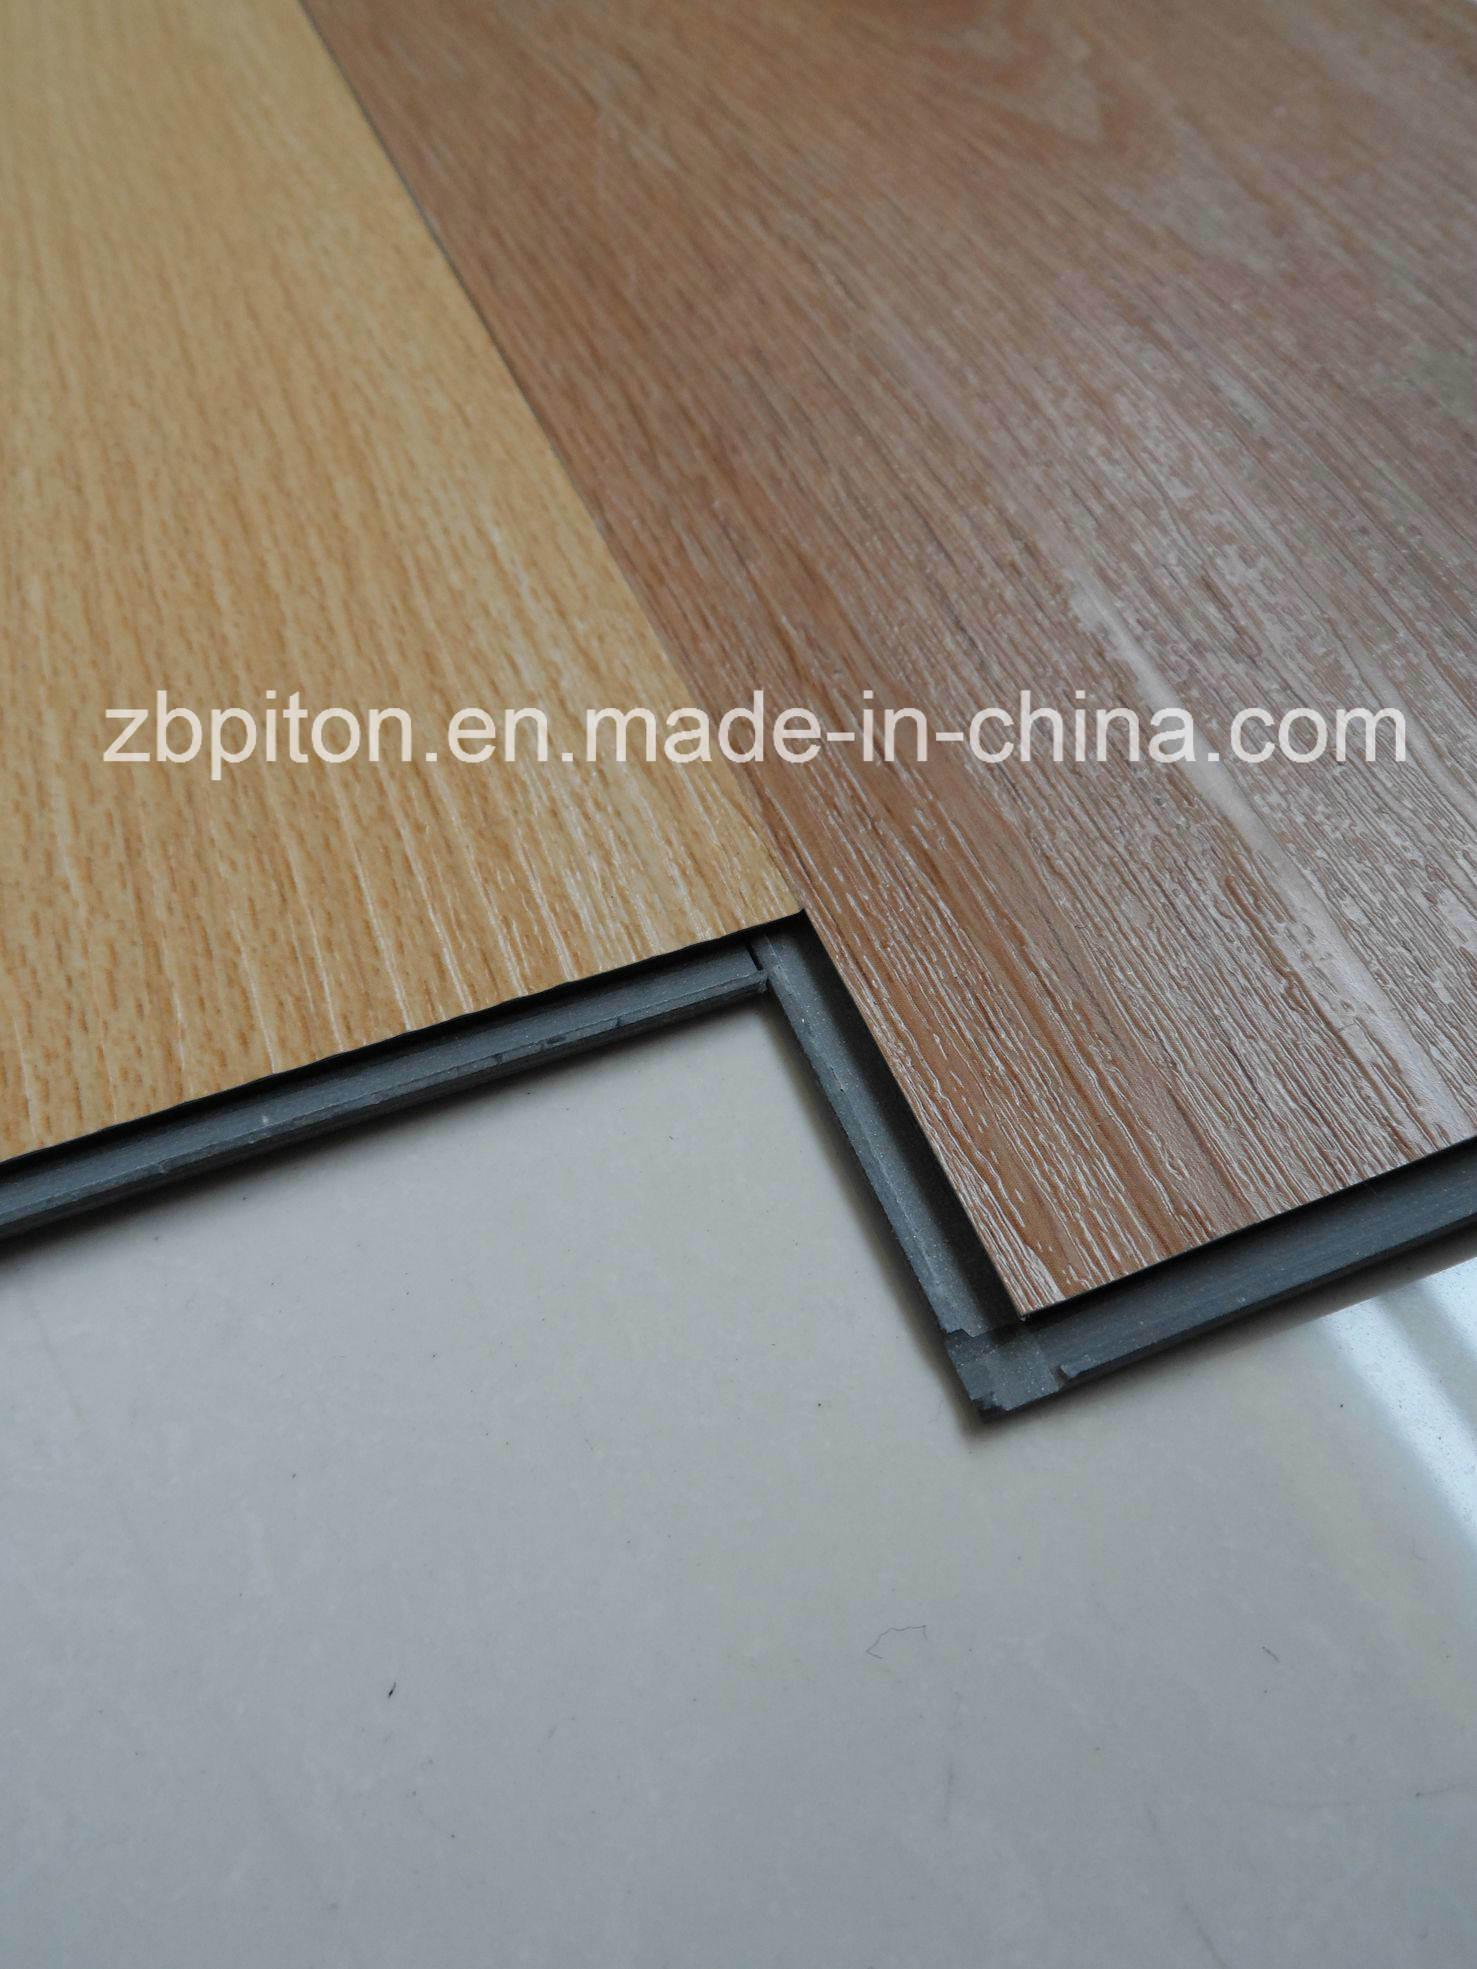 China interlocking pvc vinyl flooring tile pvc plank cng0254n interlocking pvc vinyl flooring tile pvc plank cng0254n doublecrazyfo Images